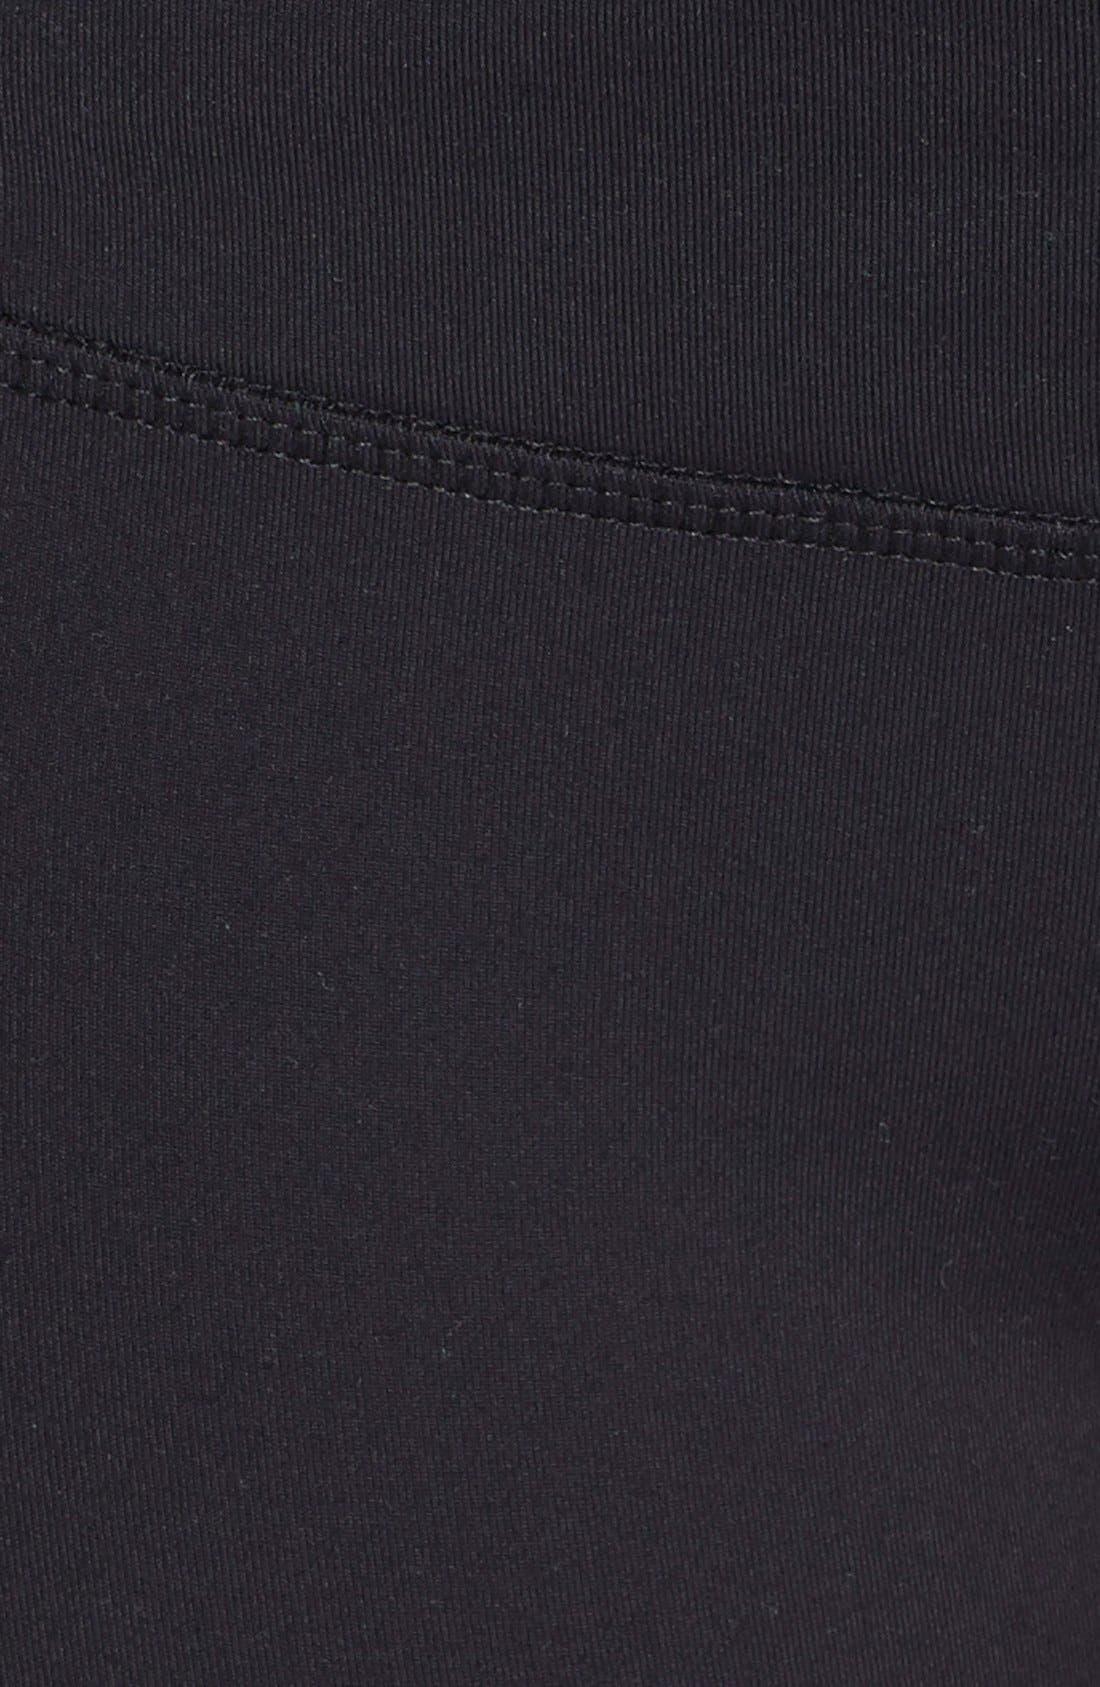 'Icon' Performance Sweatpants,                             Alternate thumbnail 4, color,                             001